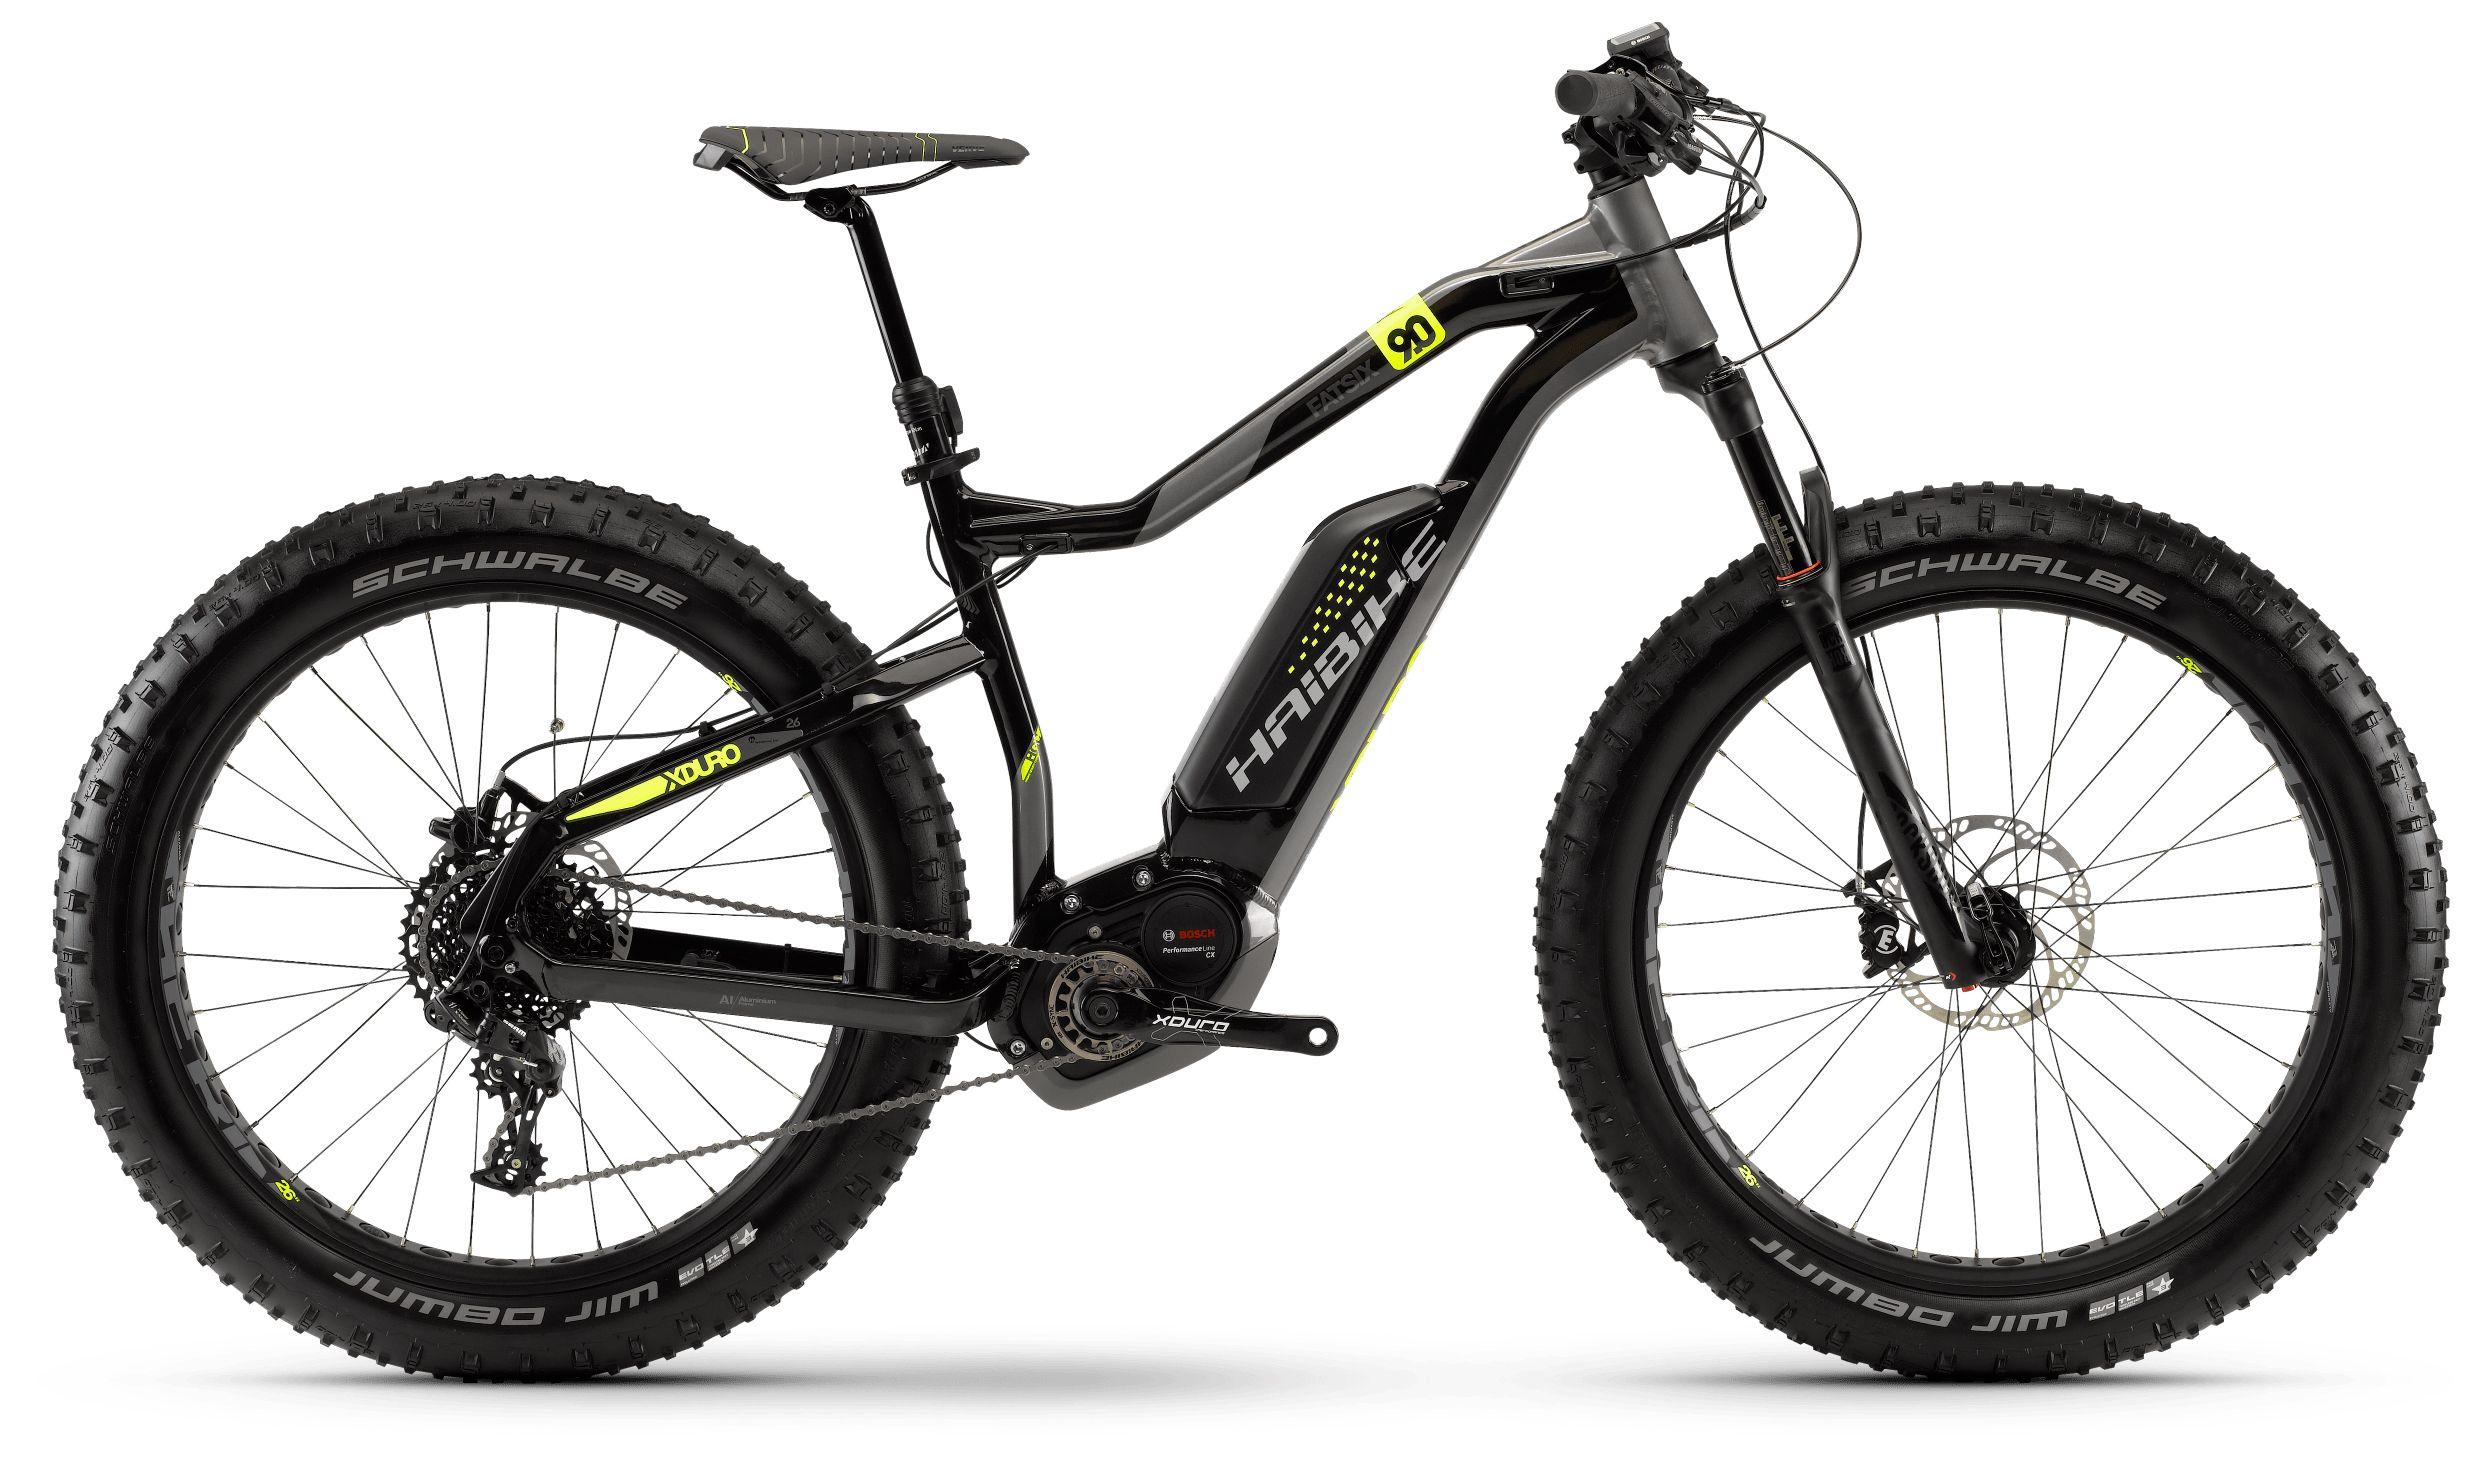 Велосипед Haibike Xduro FatSix 9.0 500Wh 11s NX 2018